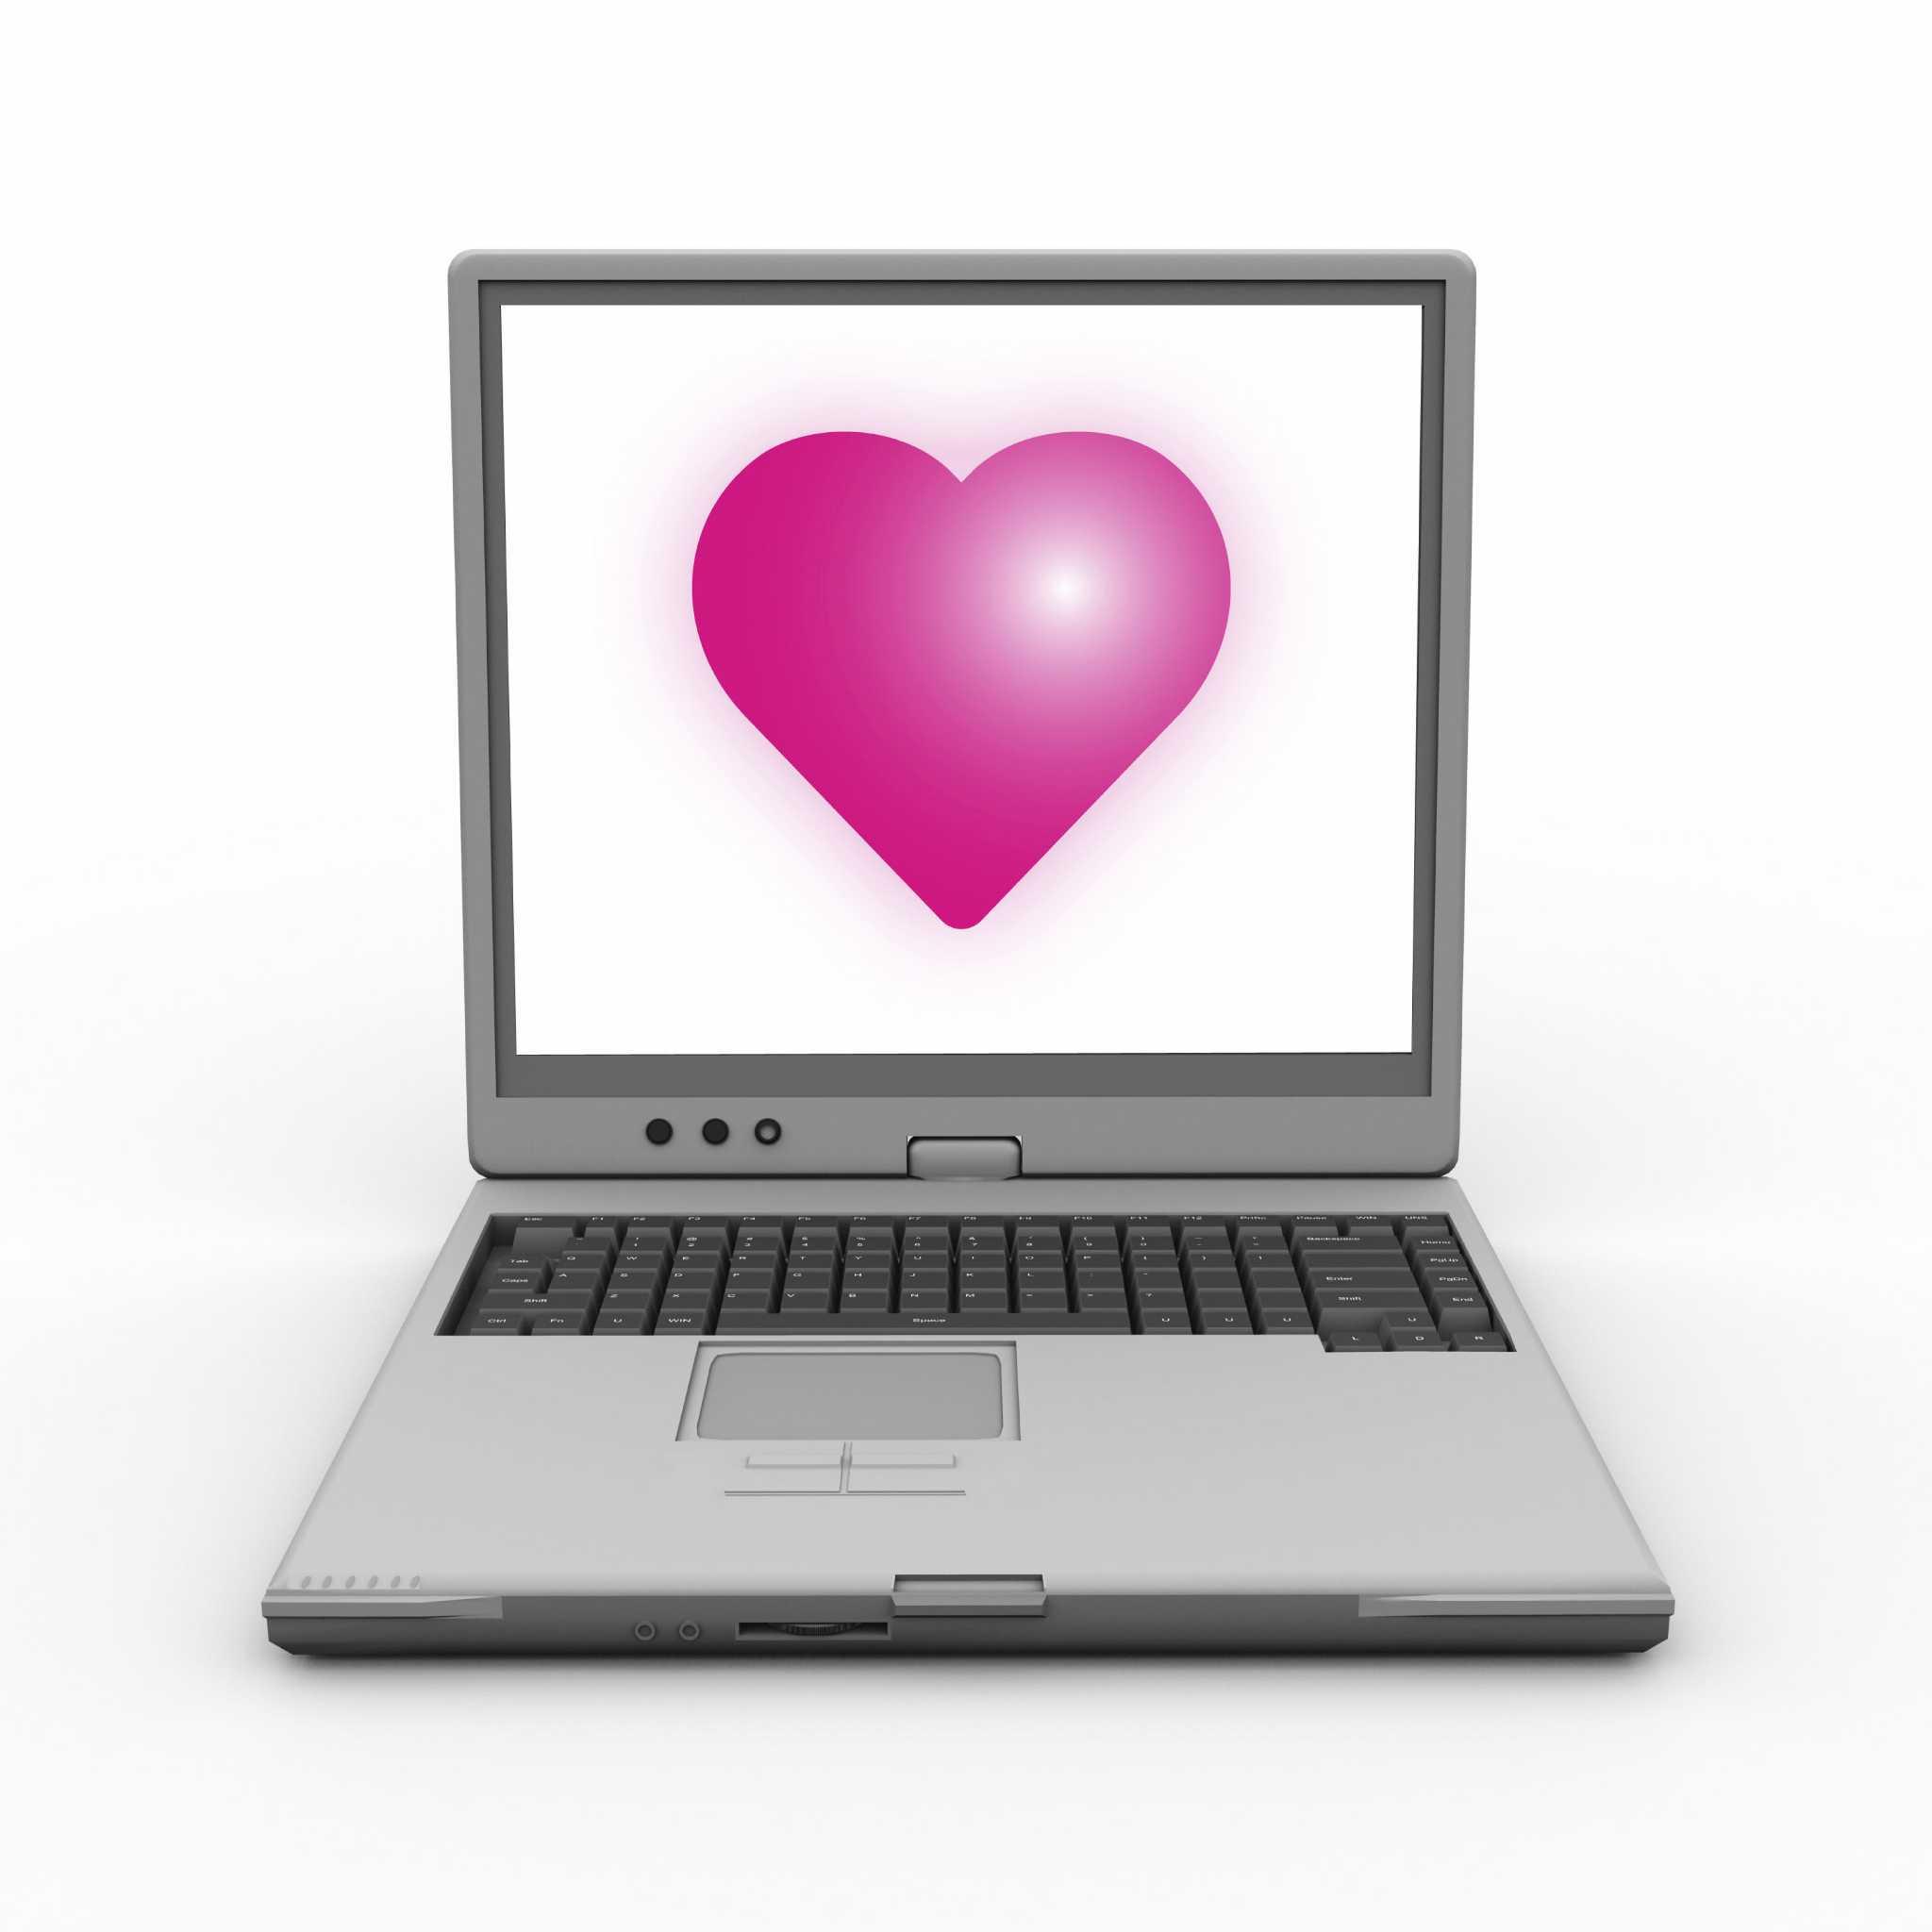 San antonio online dating